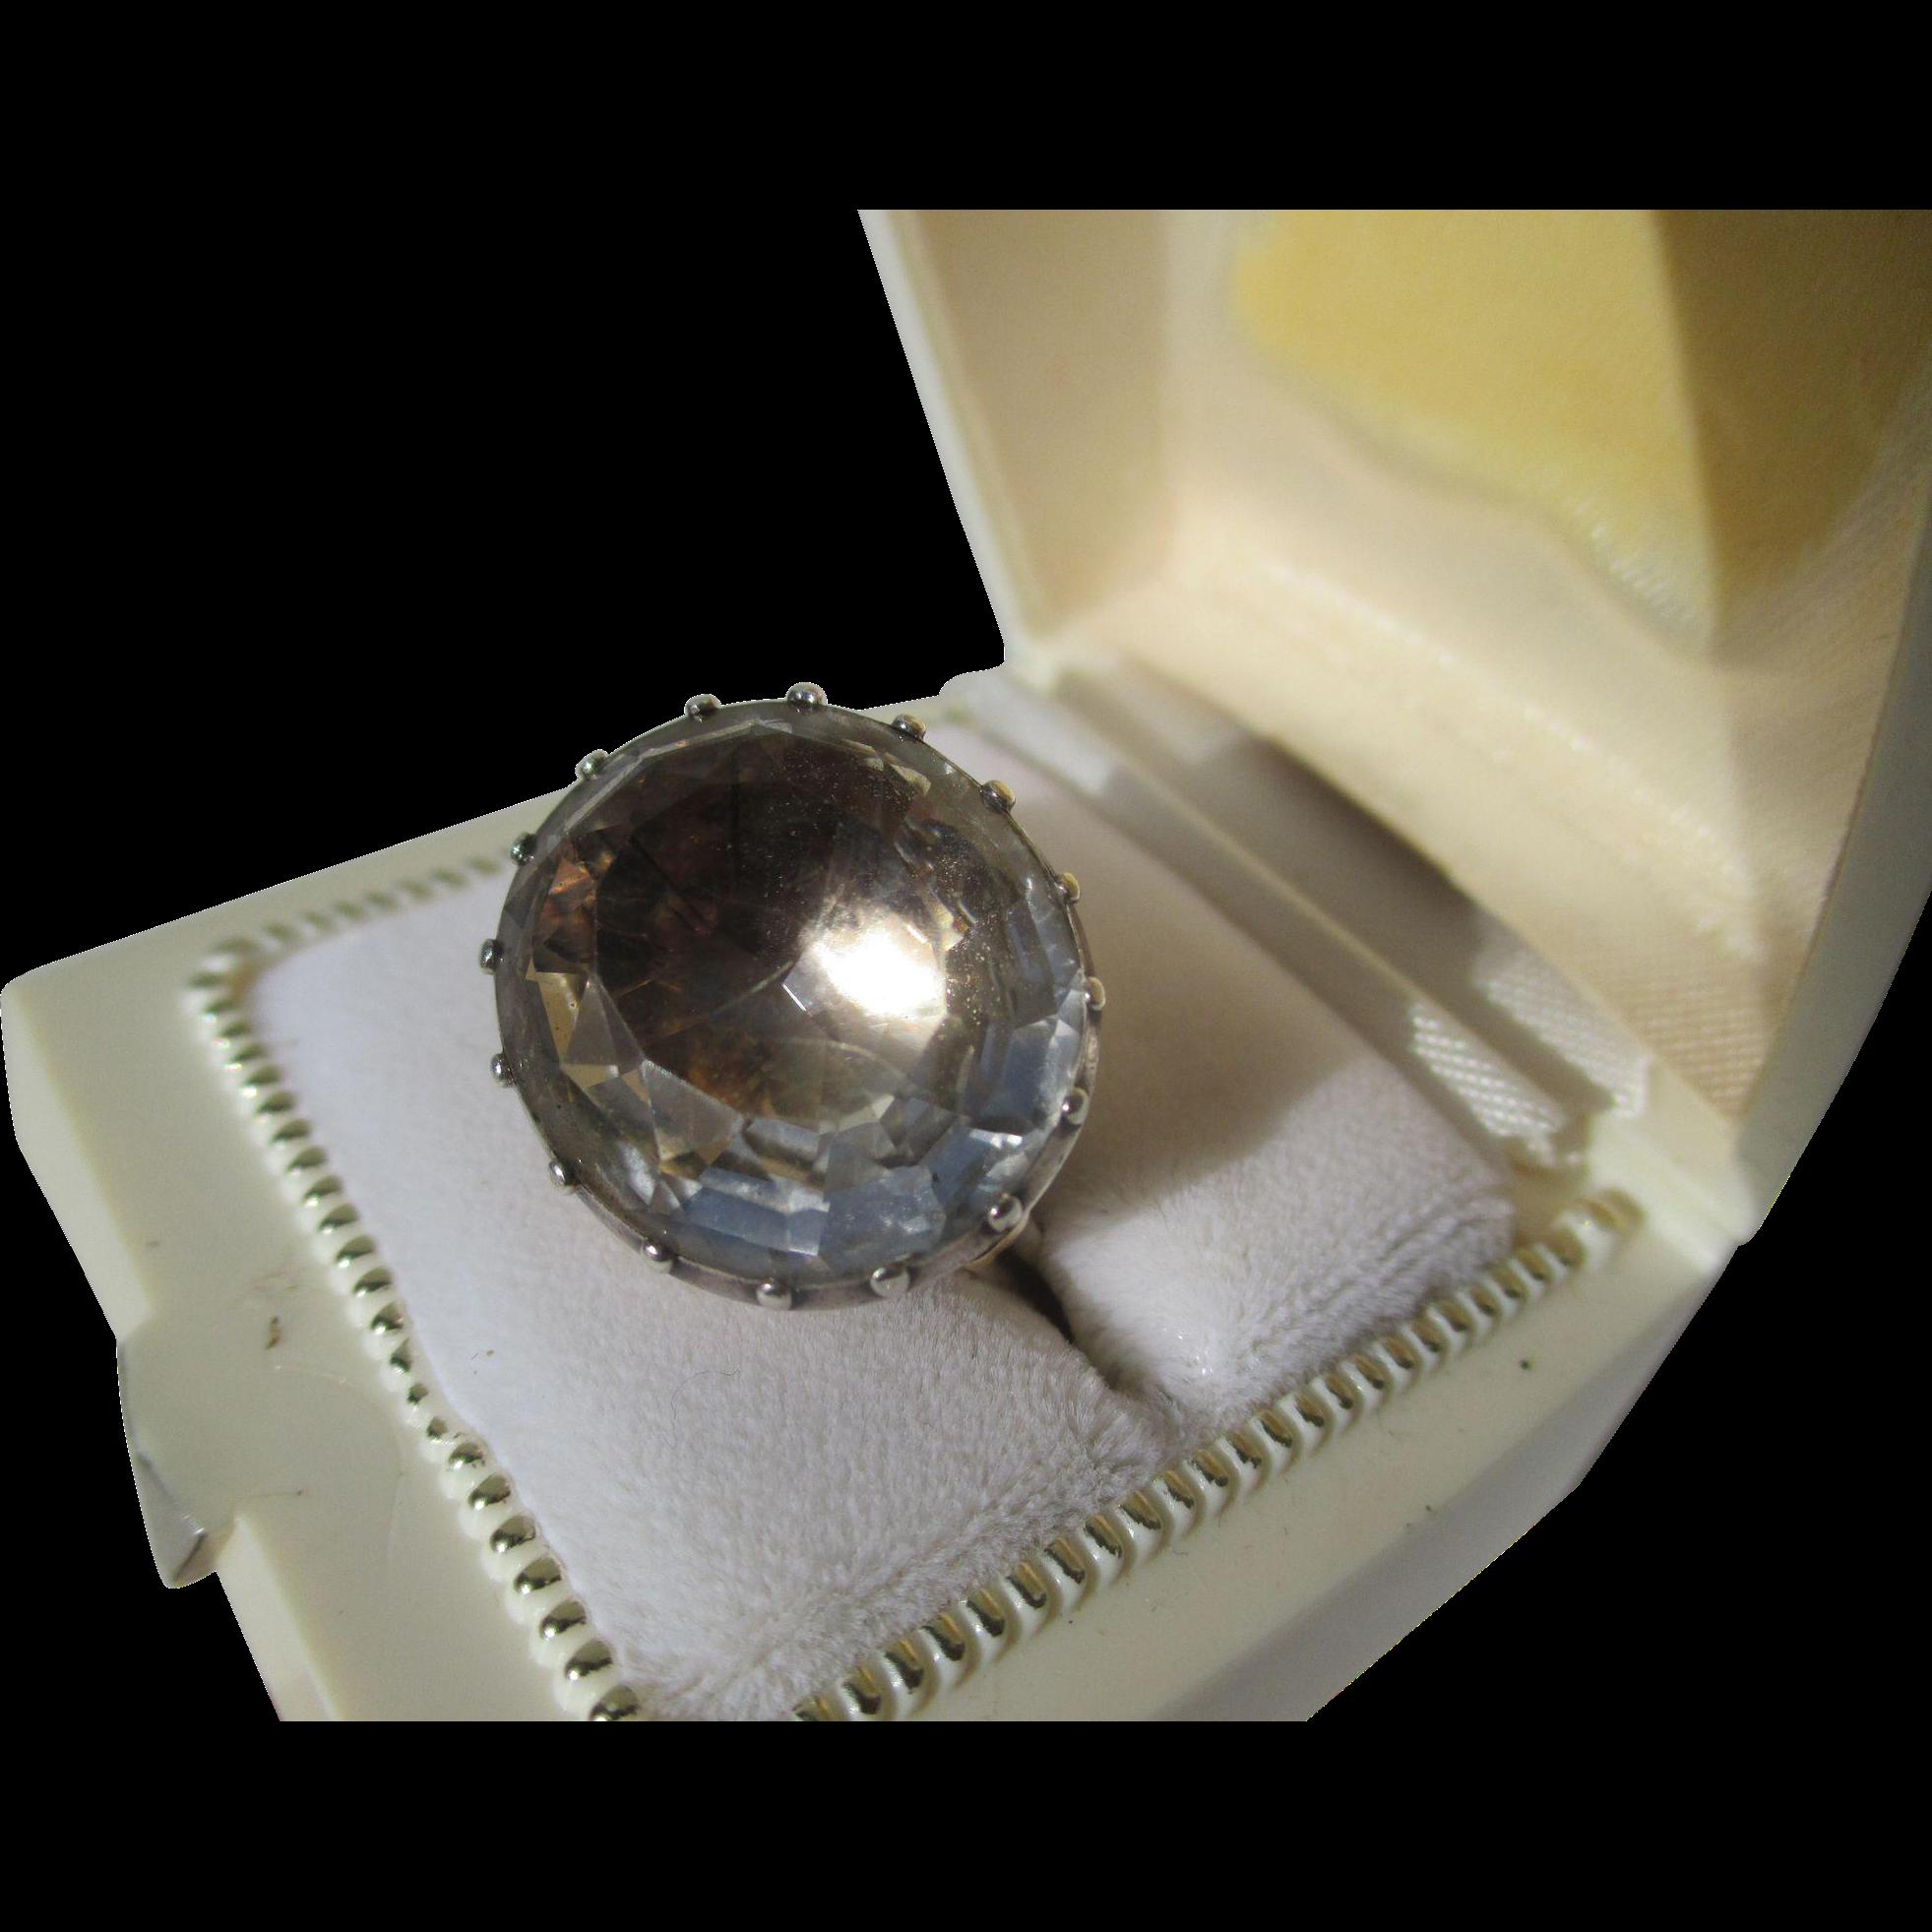 Shop Special! Spectacular 22 Carat Natural Quartz Crystal Georgian Ring